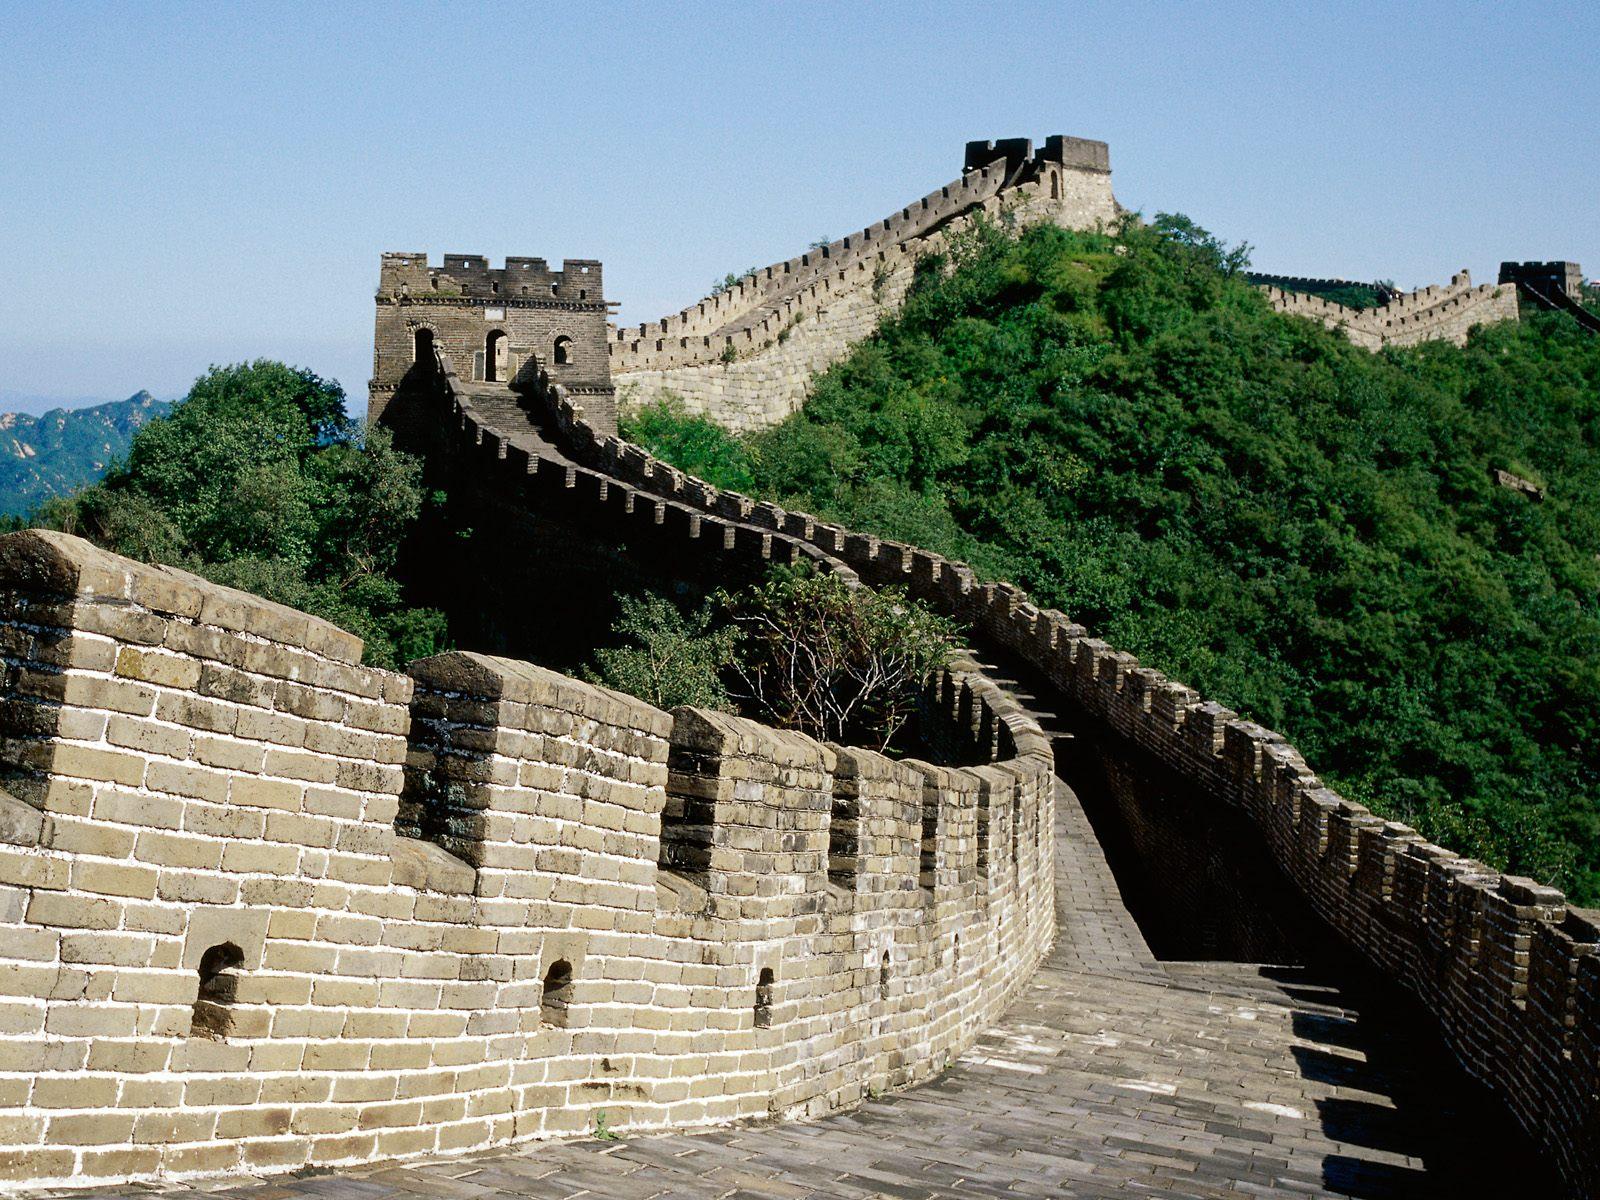 http://4.bp.blogspot.com/-AtqWTDAJf6s/UI7zVFJIpAI/AAAAAAAACtE/vR2UmrCgETg/s1600/Fotograf%C3%ADa+muy+buena+de+la+gran+muralla+china.jpg